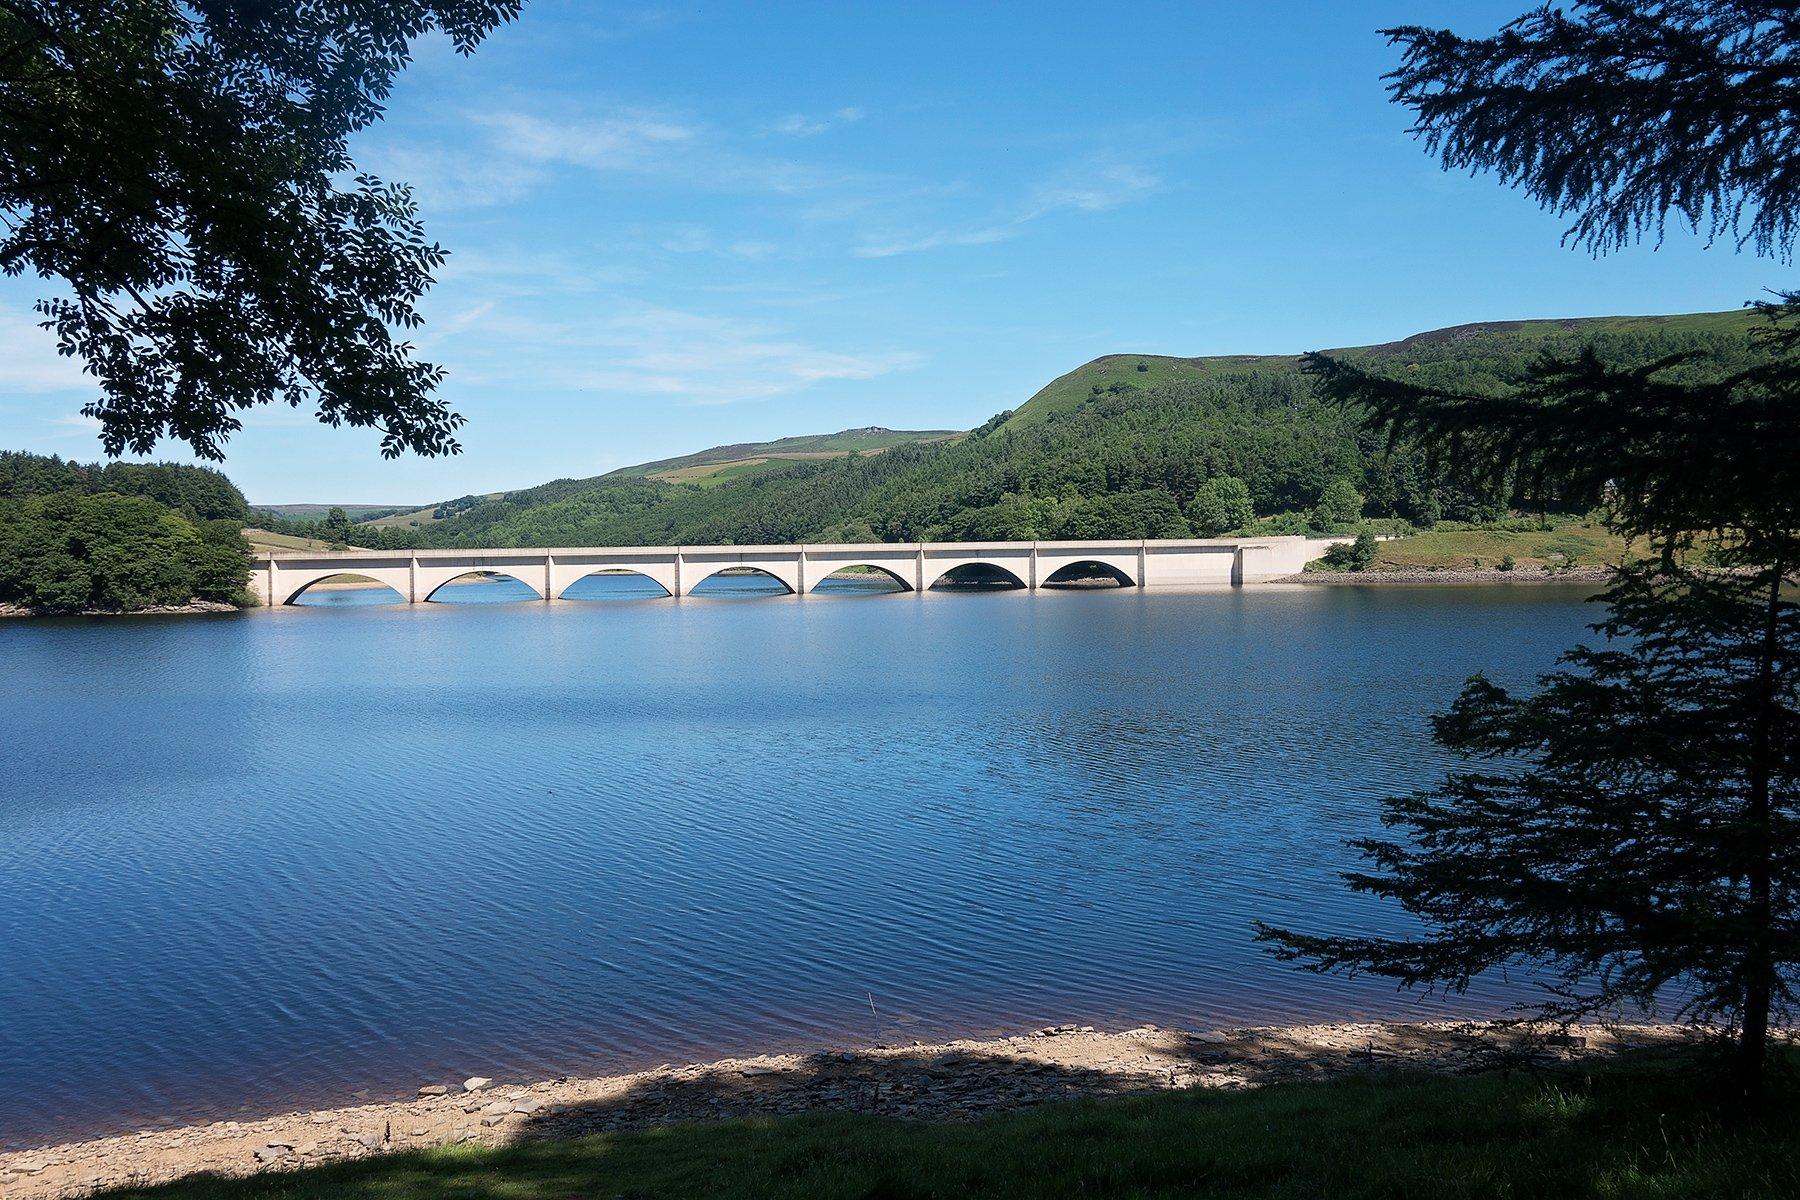 Ladybower Reservoir in Derbyshire